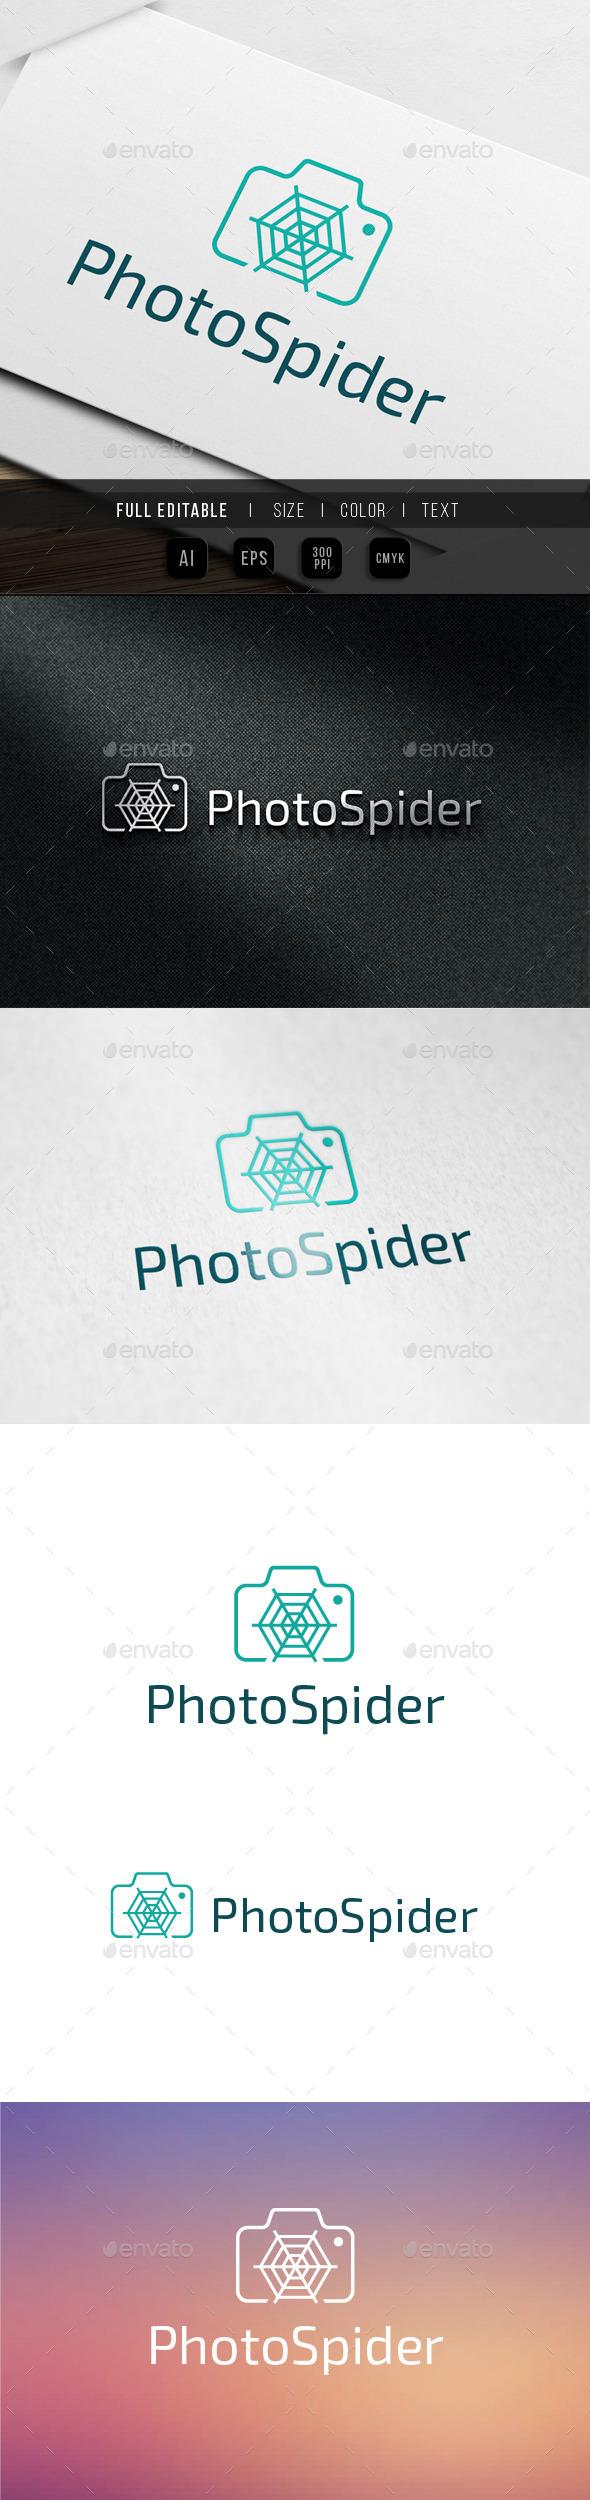 Photo Spider - Micro Shot Logo Template